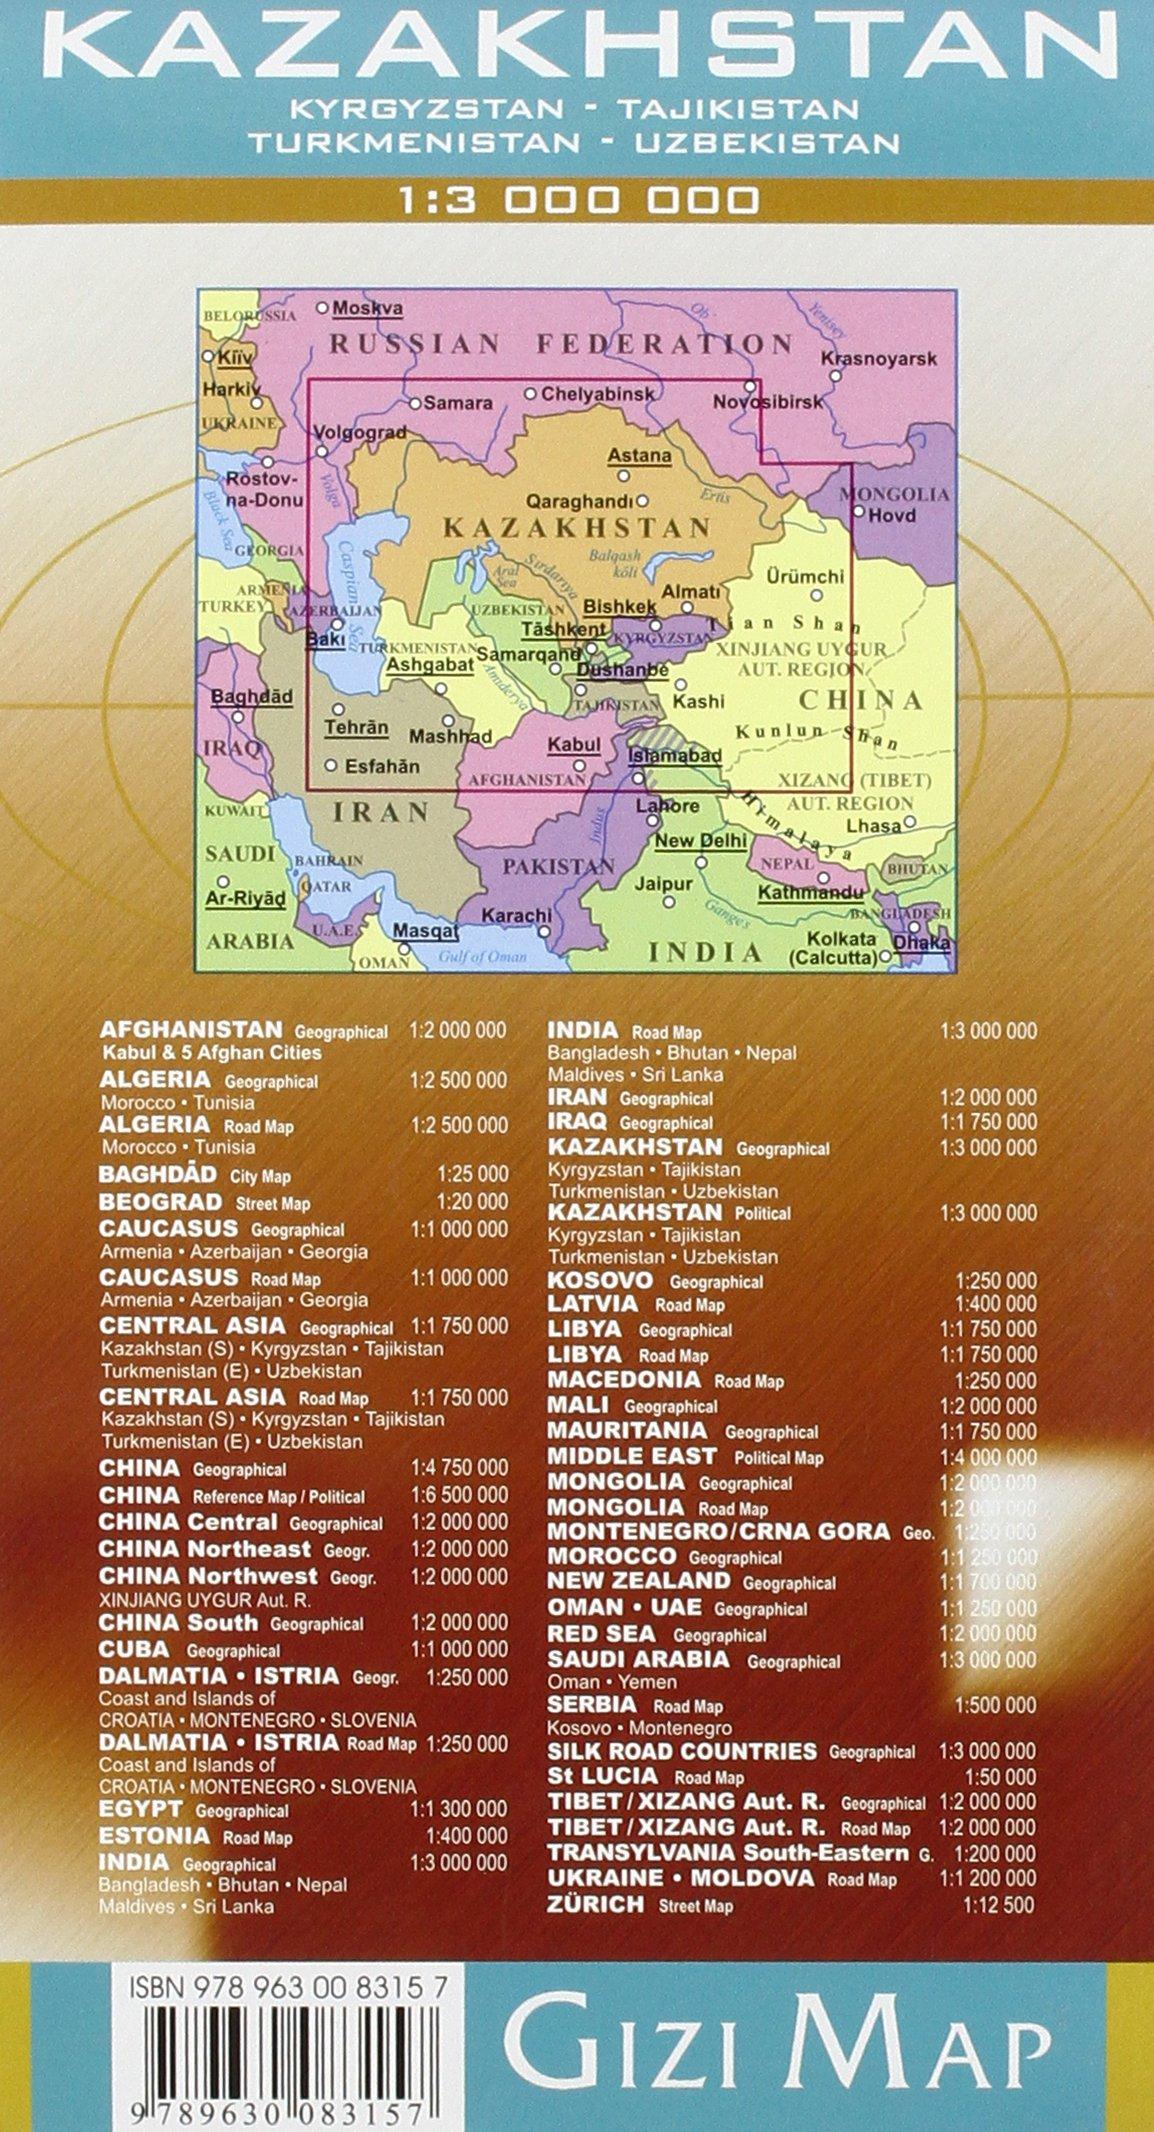 Kazakhstan, Kyrgyzstan, Tajikistan, Turkmenistan, Uzbekistan Map (English, German and Hungarian Edition)